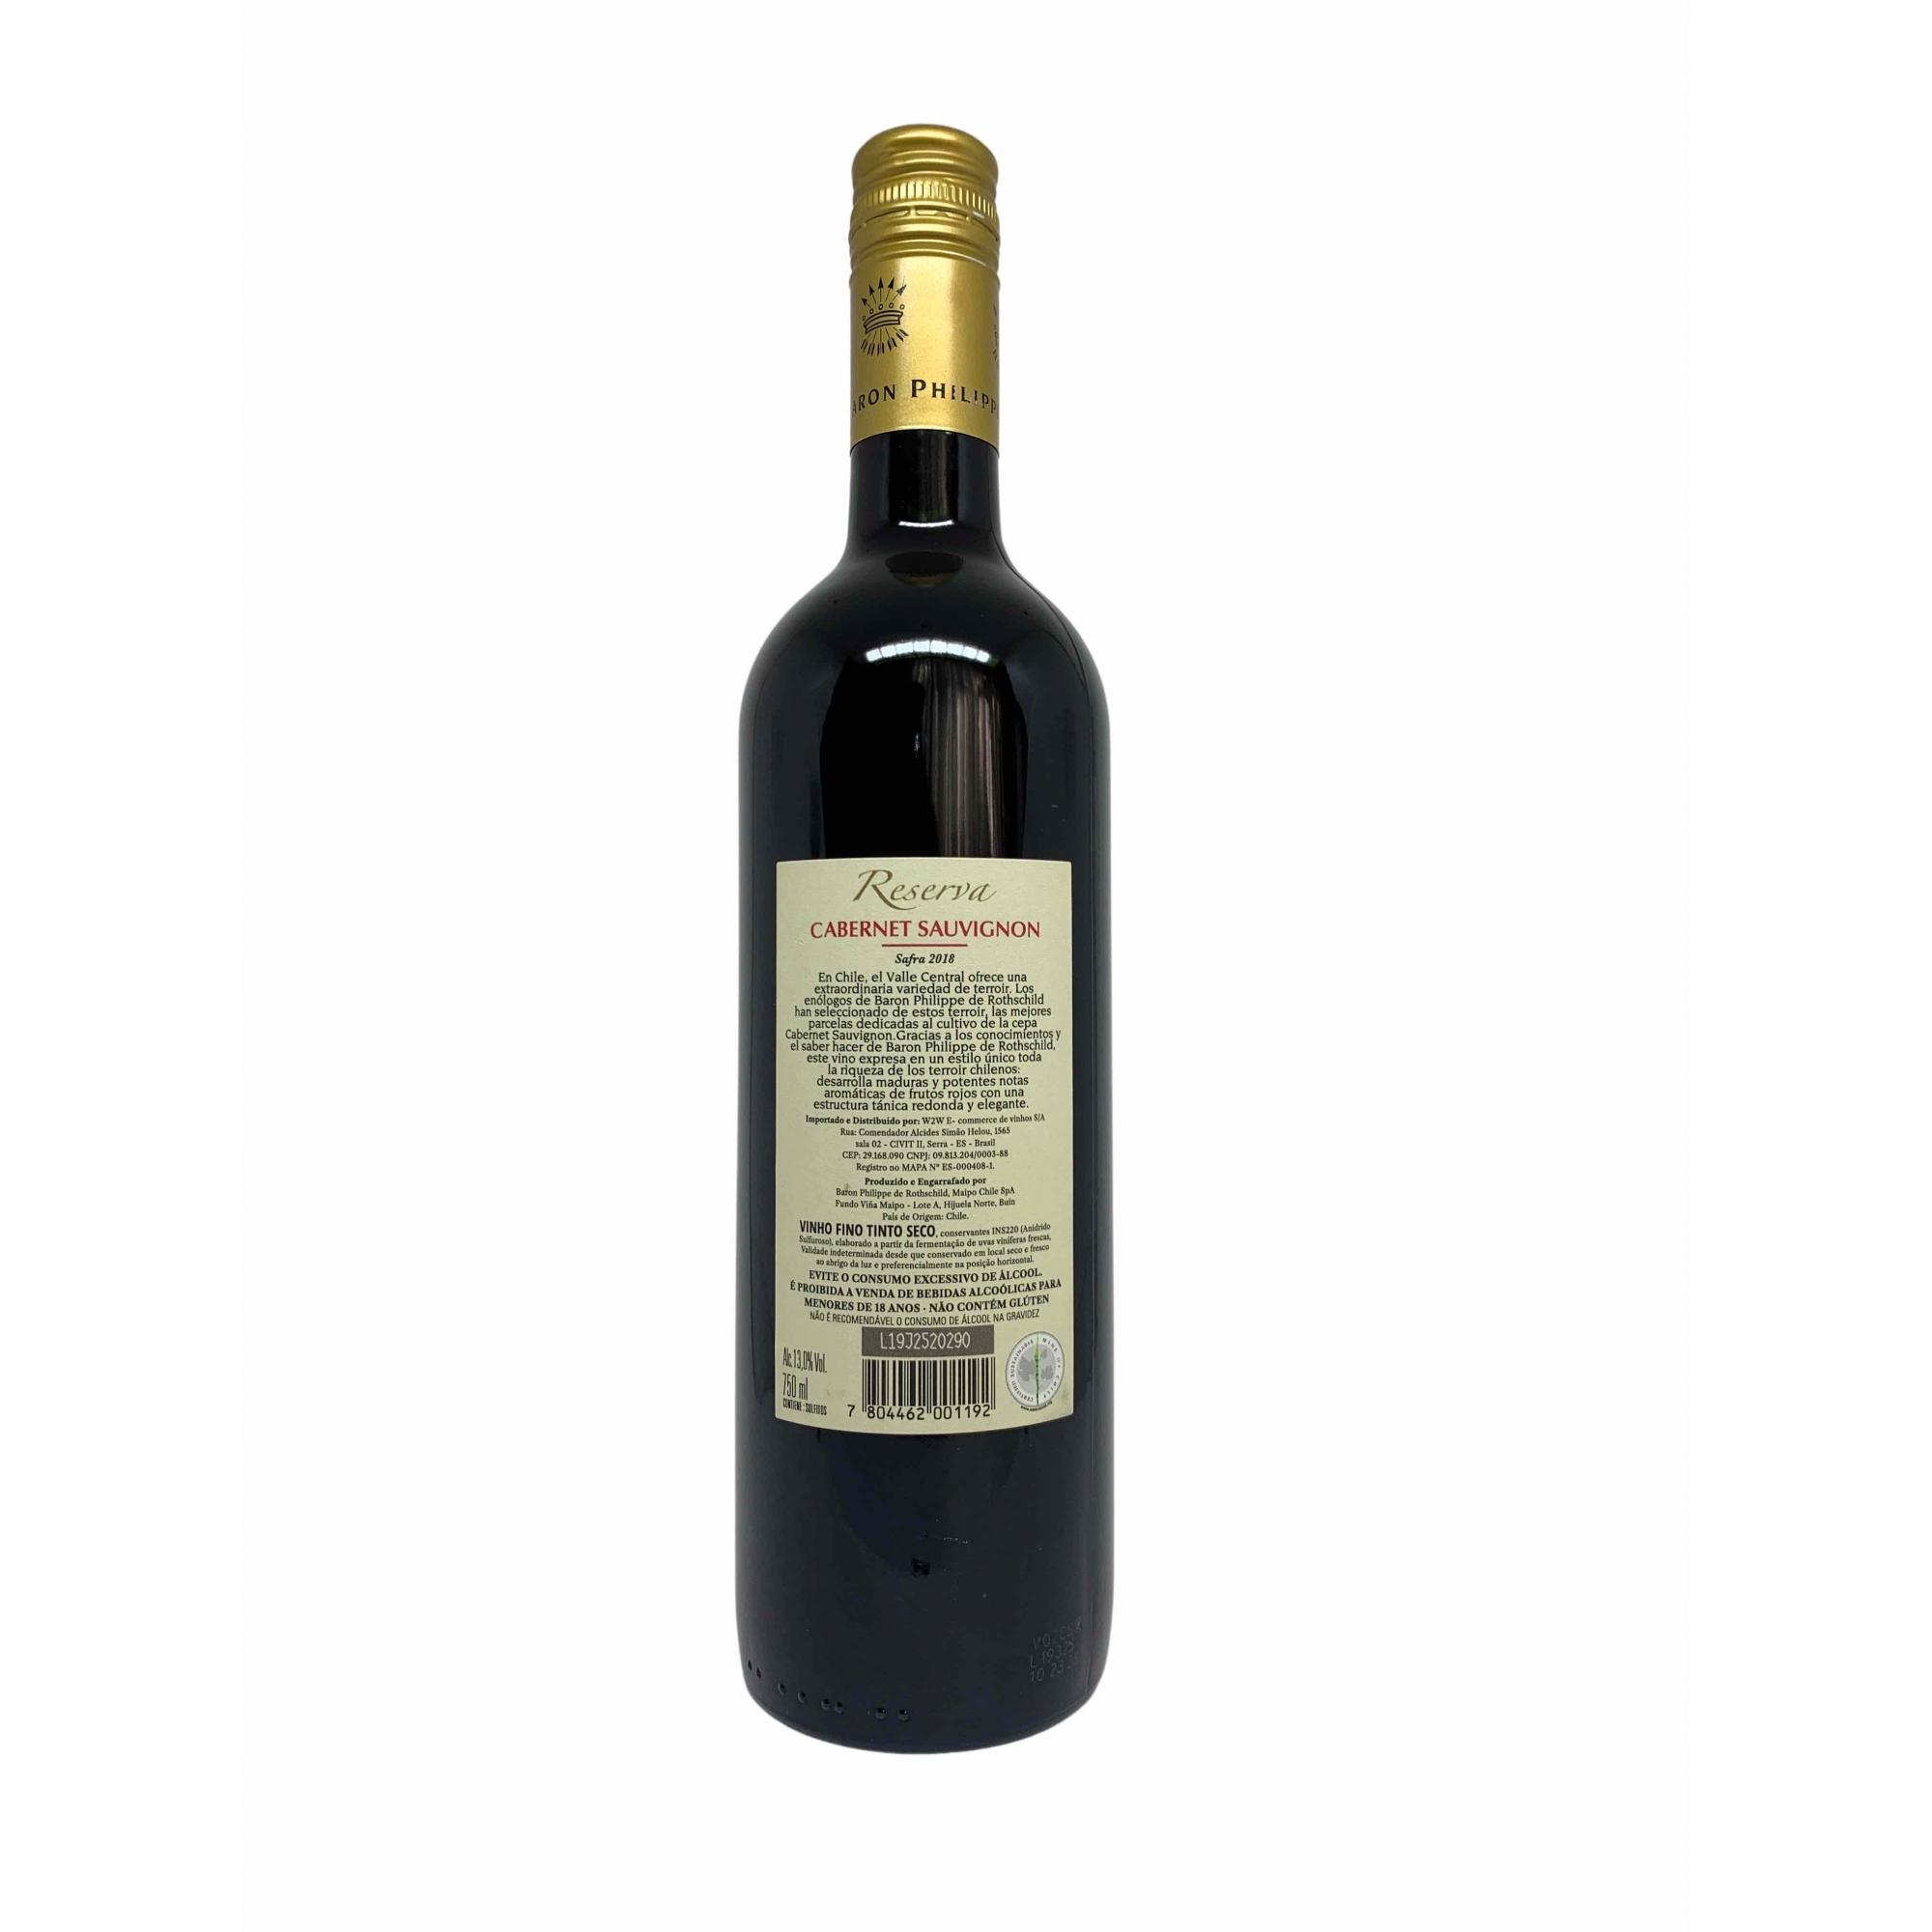 Vinho Tinto Baron Philippe de Rothschild Reserva Cabernet Sauvignon 750ml  - ADEGA FARRET